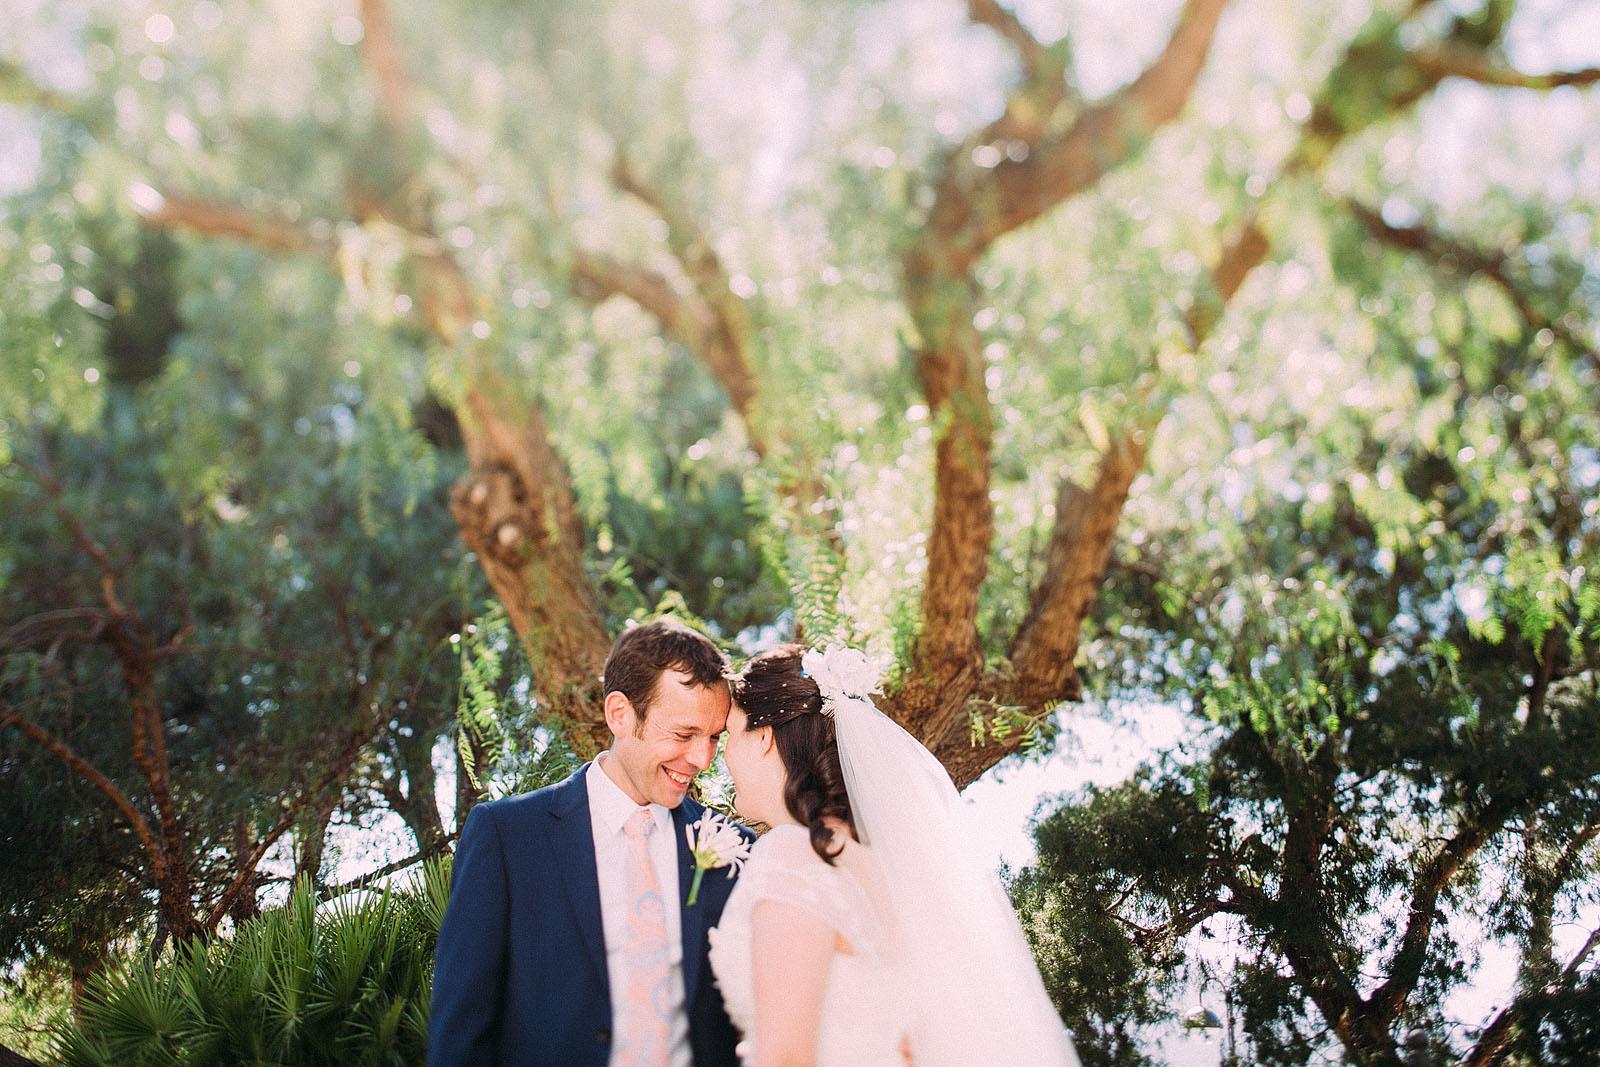 Best-2014-Lawson-Wedding-Photography0028